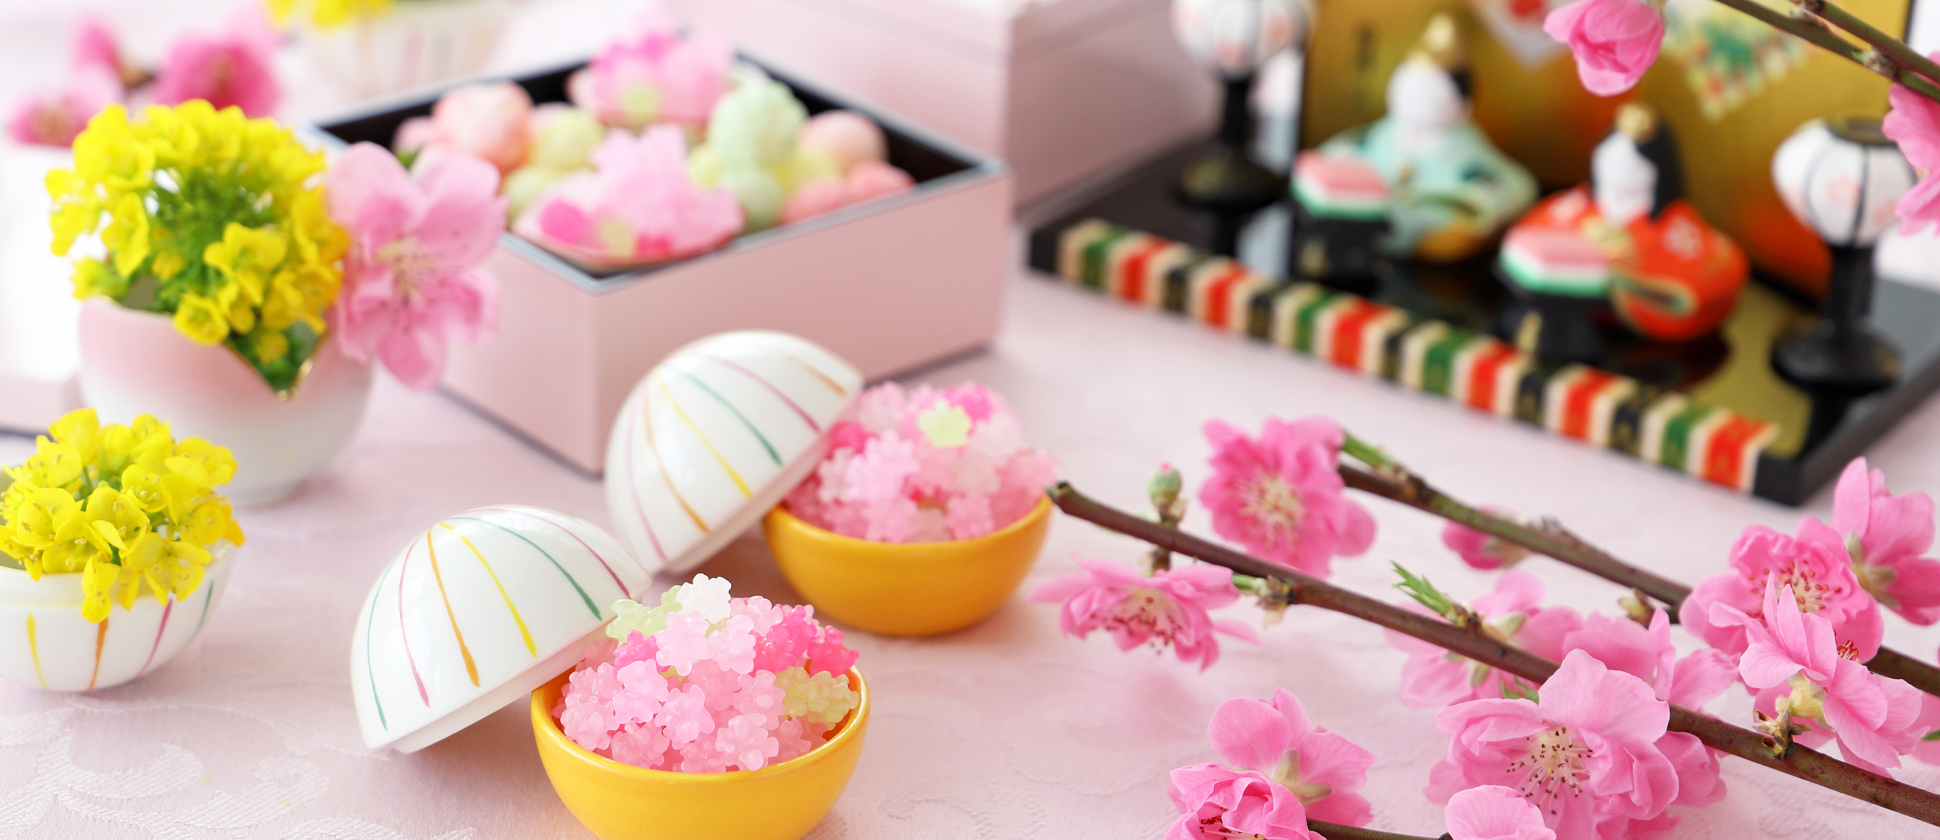 Hina Matsuri  Sweet & Sushi Offers